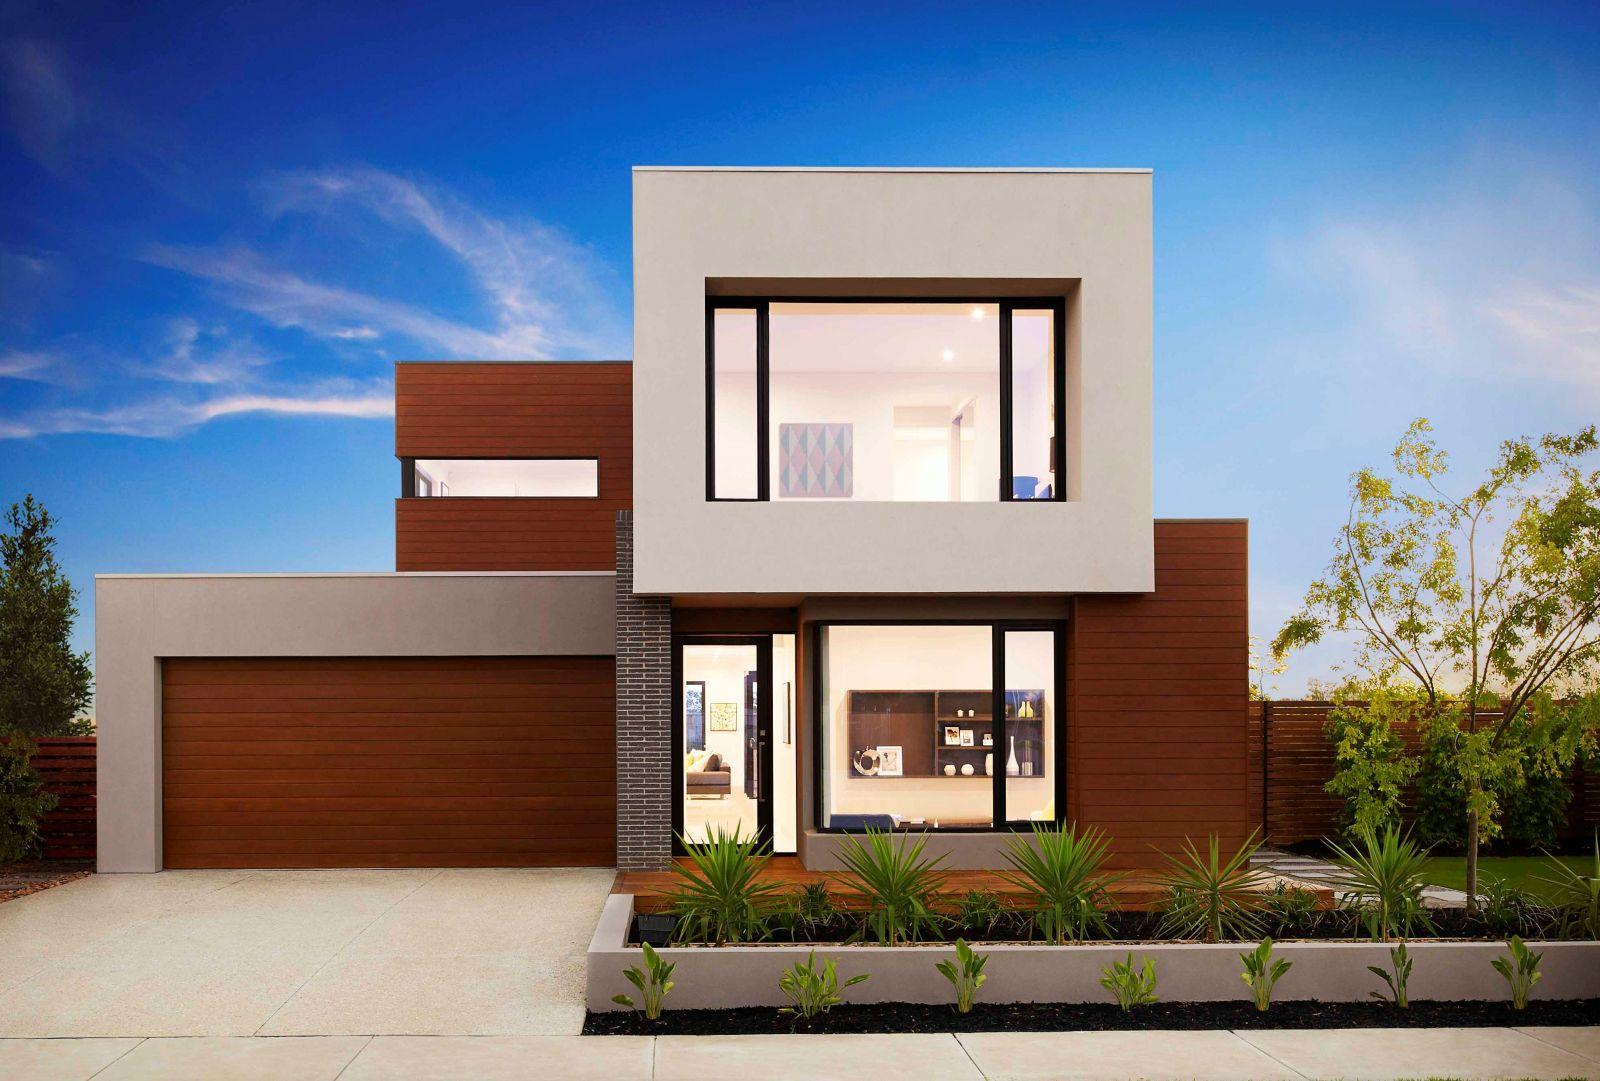 Minimalist Modern Home Designs Pinoy House Designs Pinoy House Designs